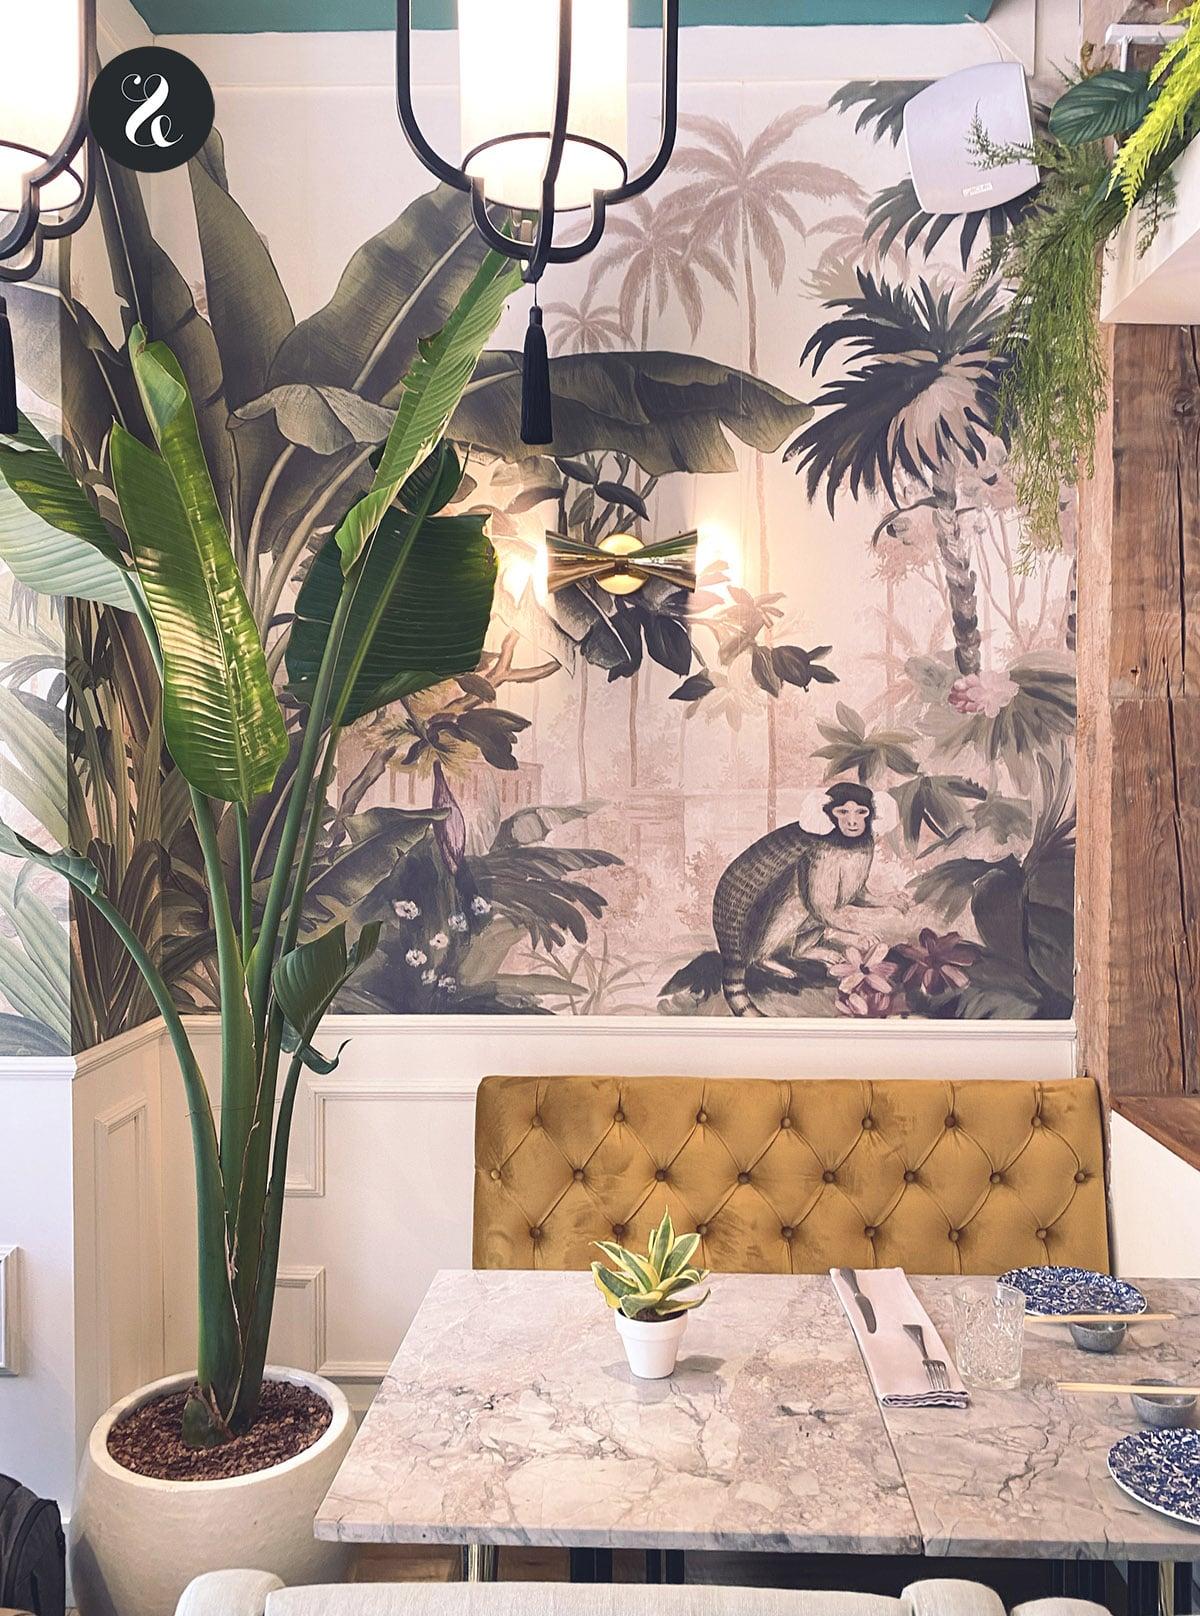 Madame Butterfly - Restaurante japonés en Madrid